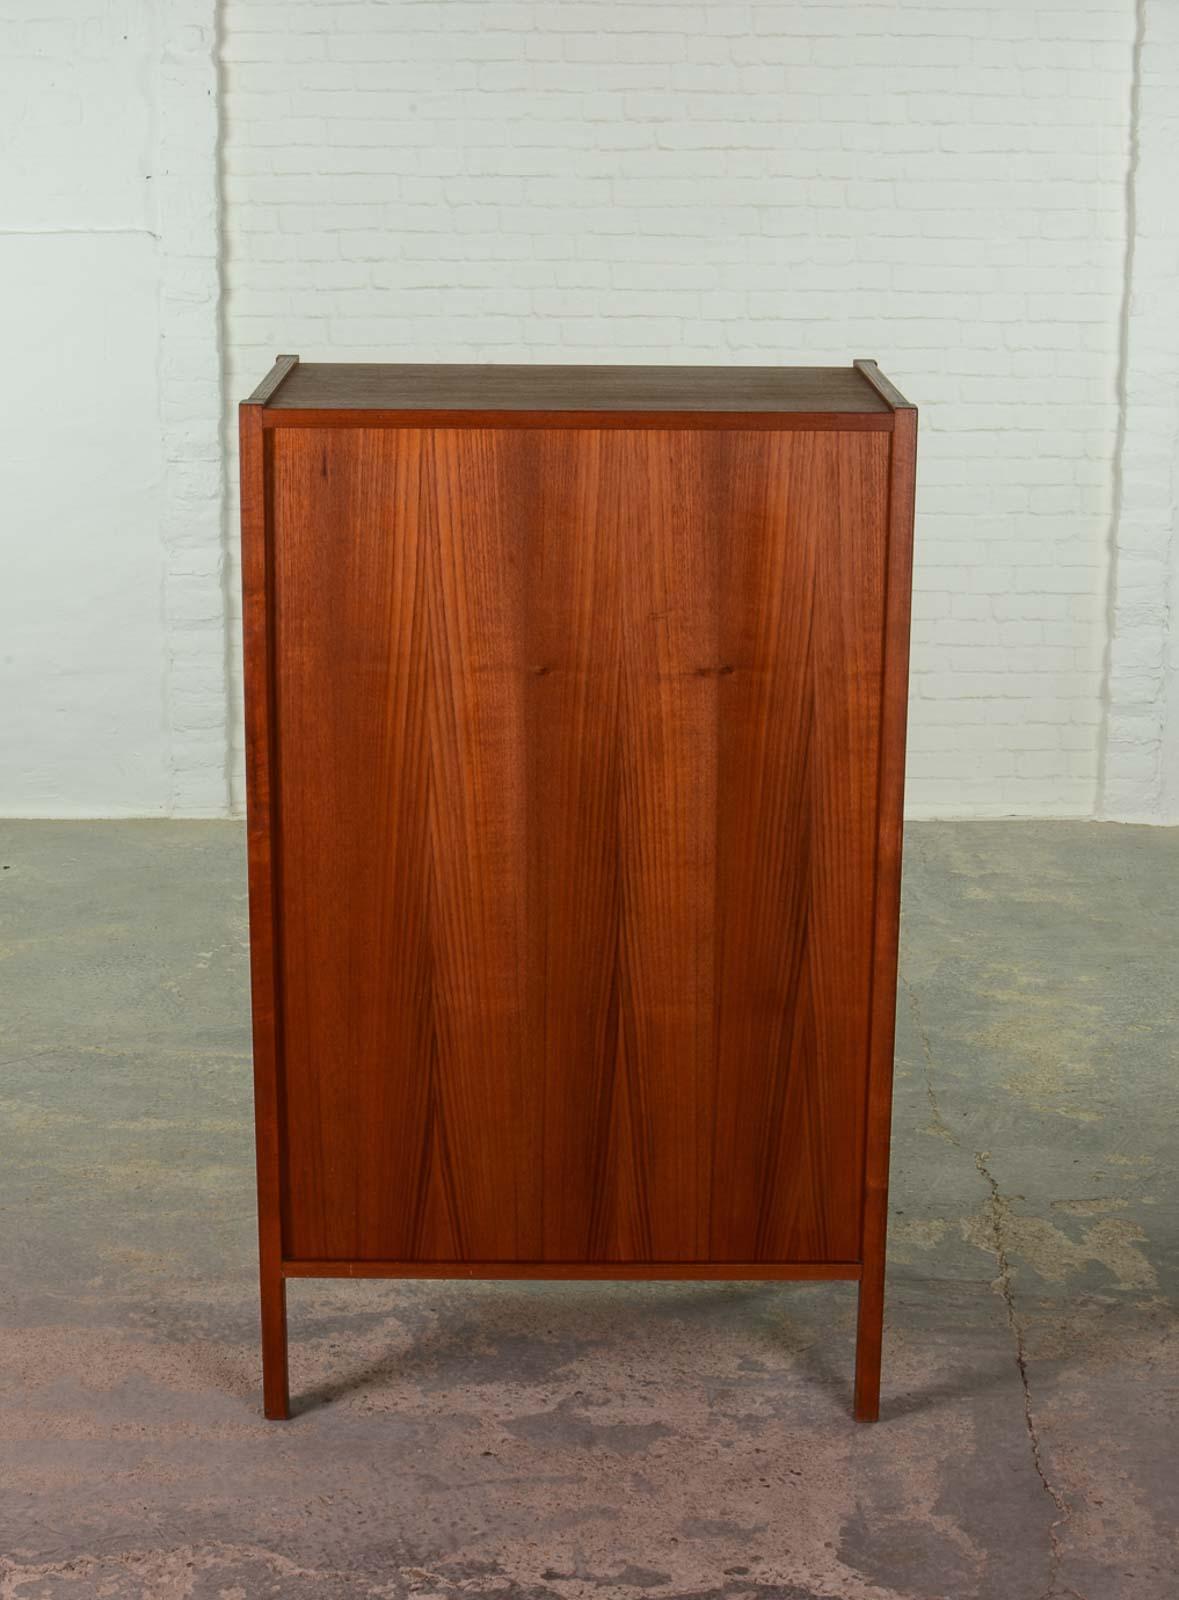 Exclusive Arne Vodder teak tall chest of drawers for Sibast. Exclusive Arne Vodder teak tall chest of drawers for Sibast